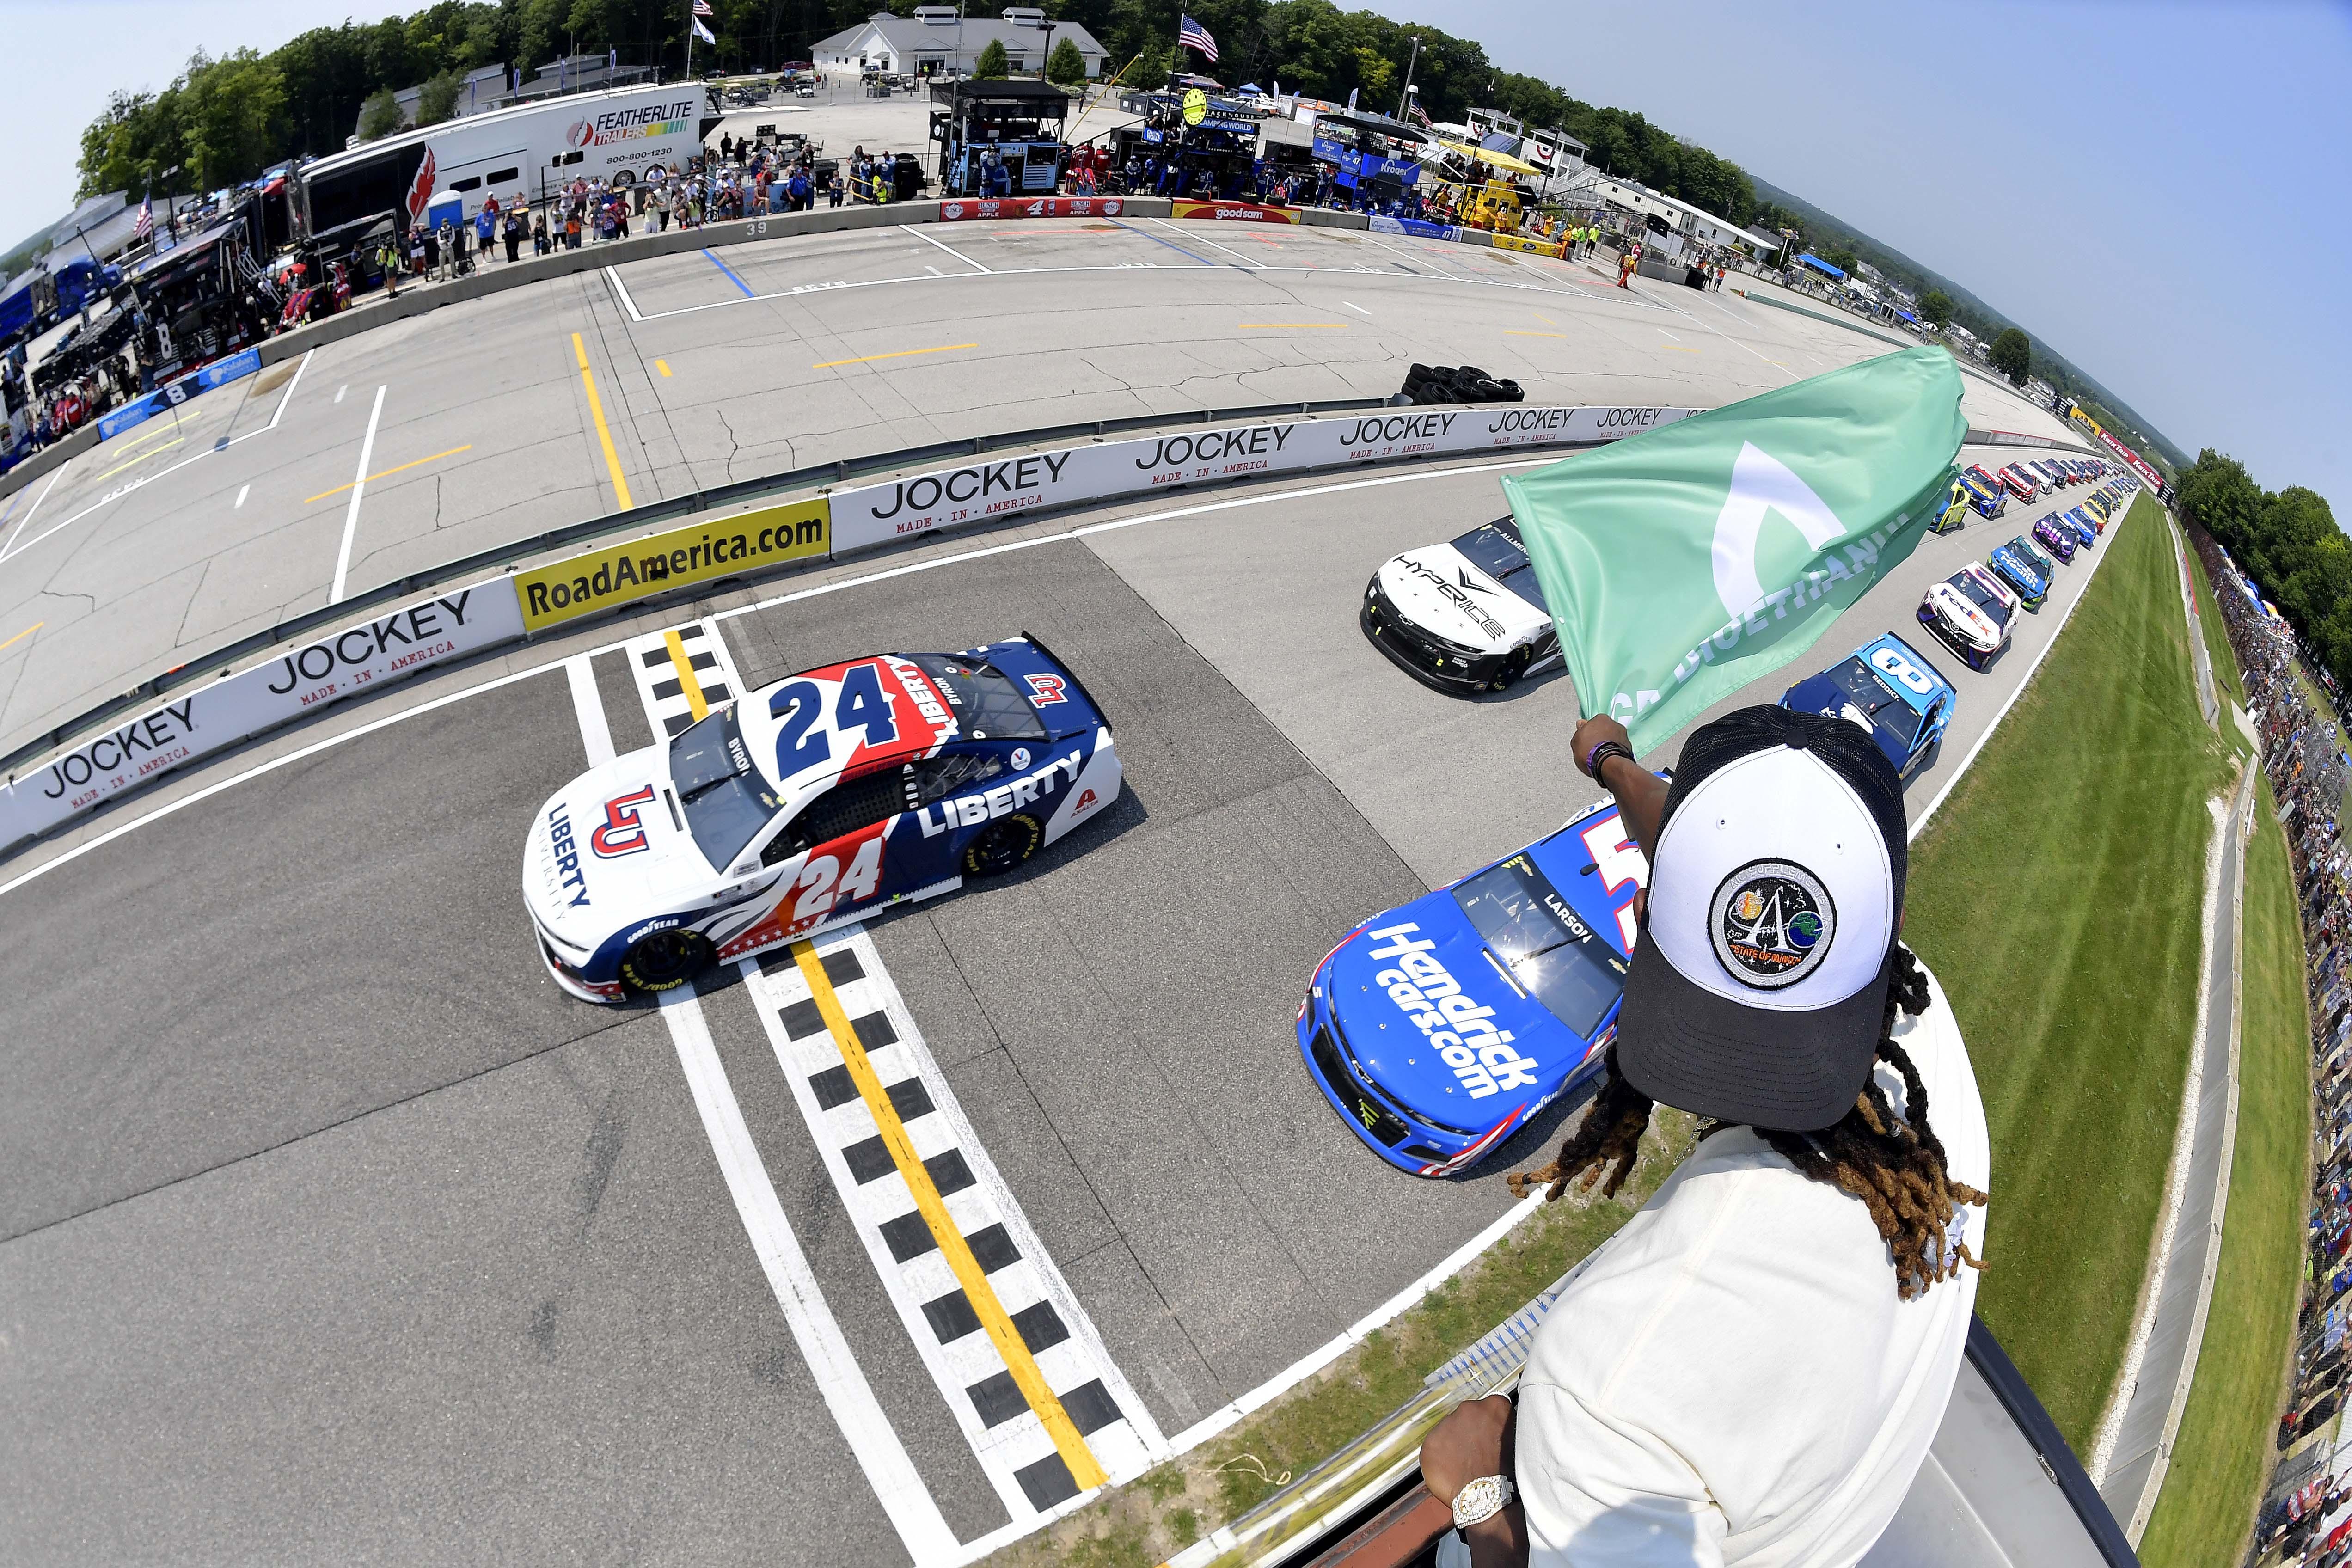 Road America - NASCAR Cup Series - Green flag